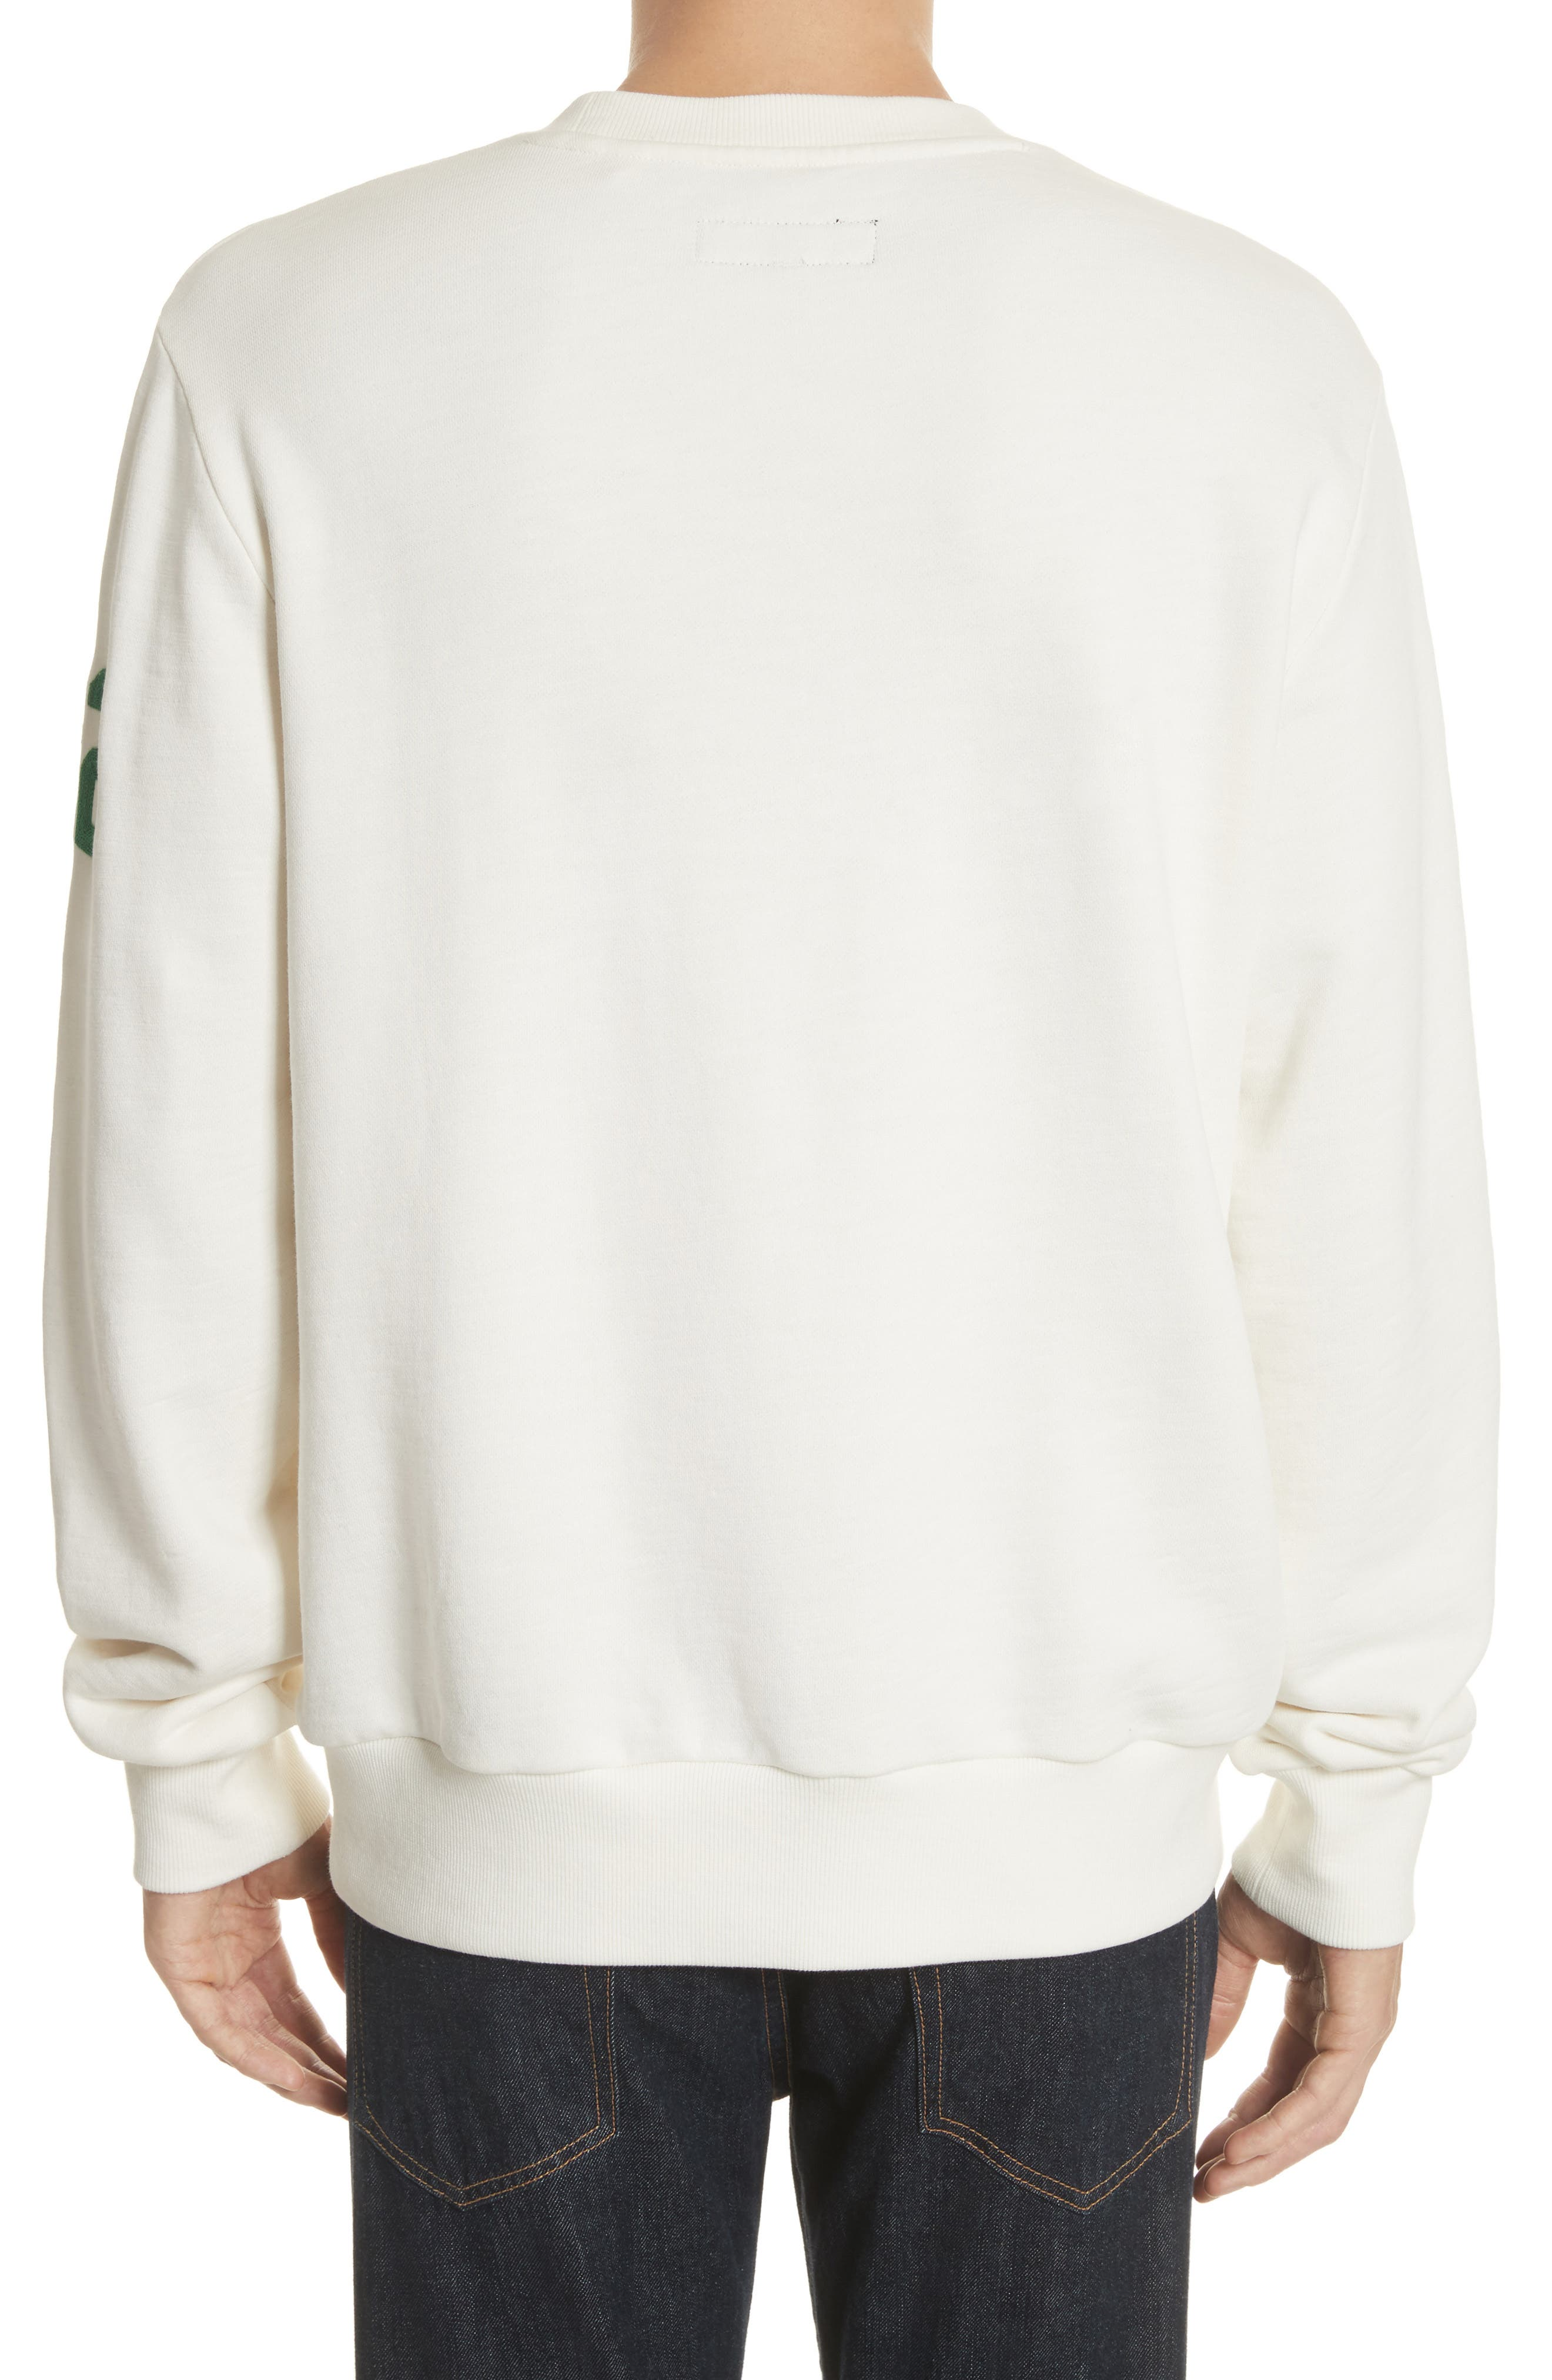 Japan Embroidered Crewneck Sweatshirt,                             Alternate thumbnail 2, color,                             900